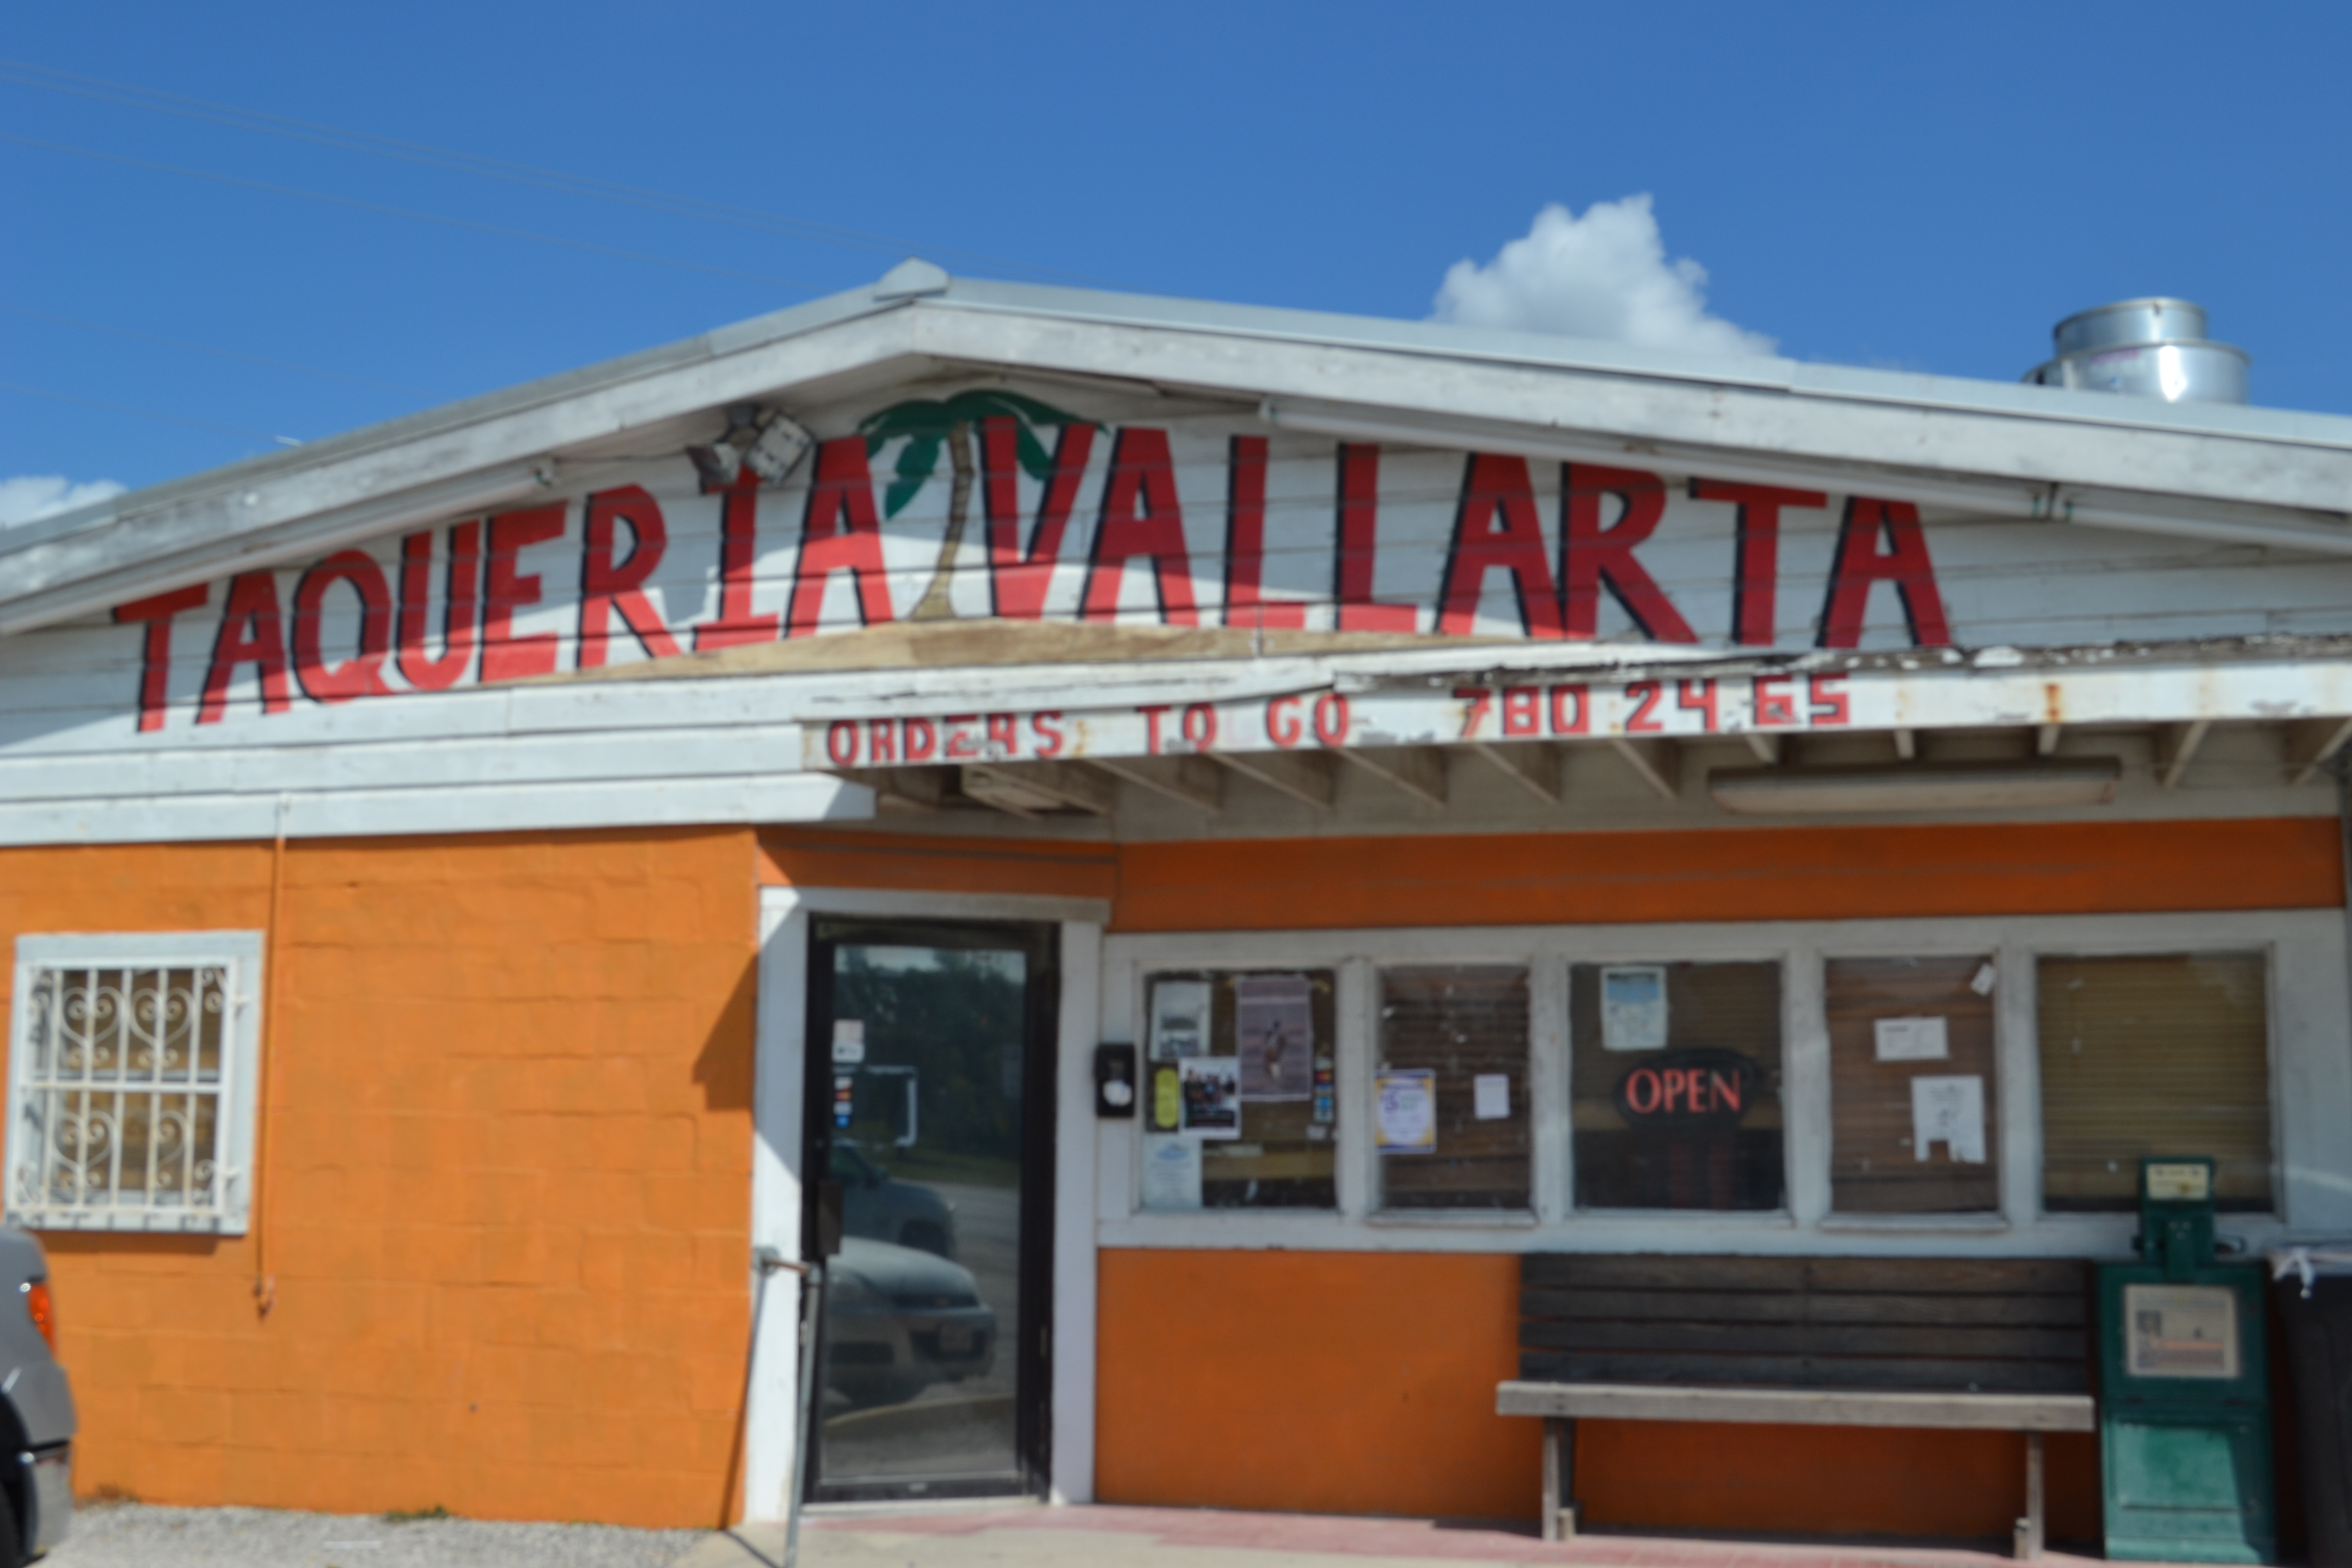 Taqueria Vallarta 202 TX-123 Karnes City, TX 78118 830 780-2465